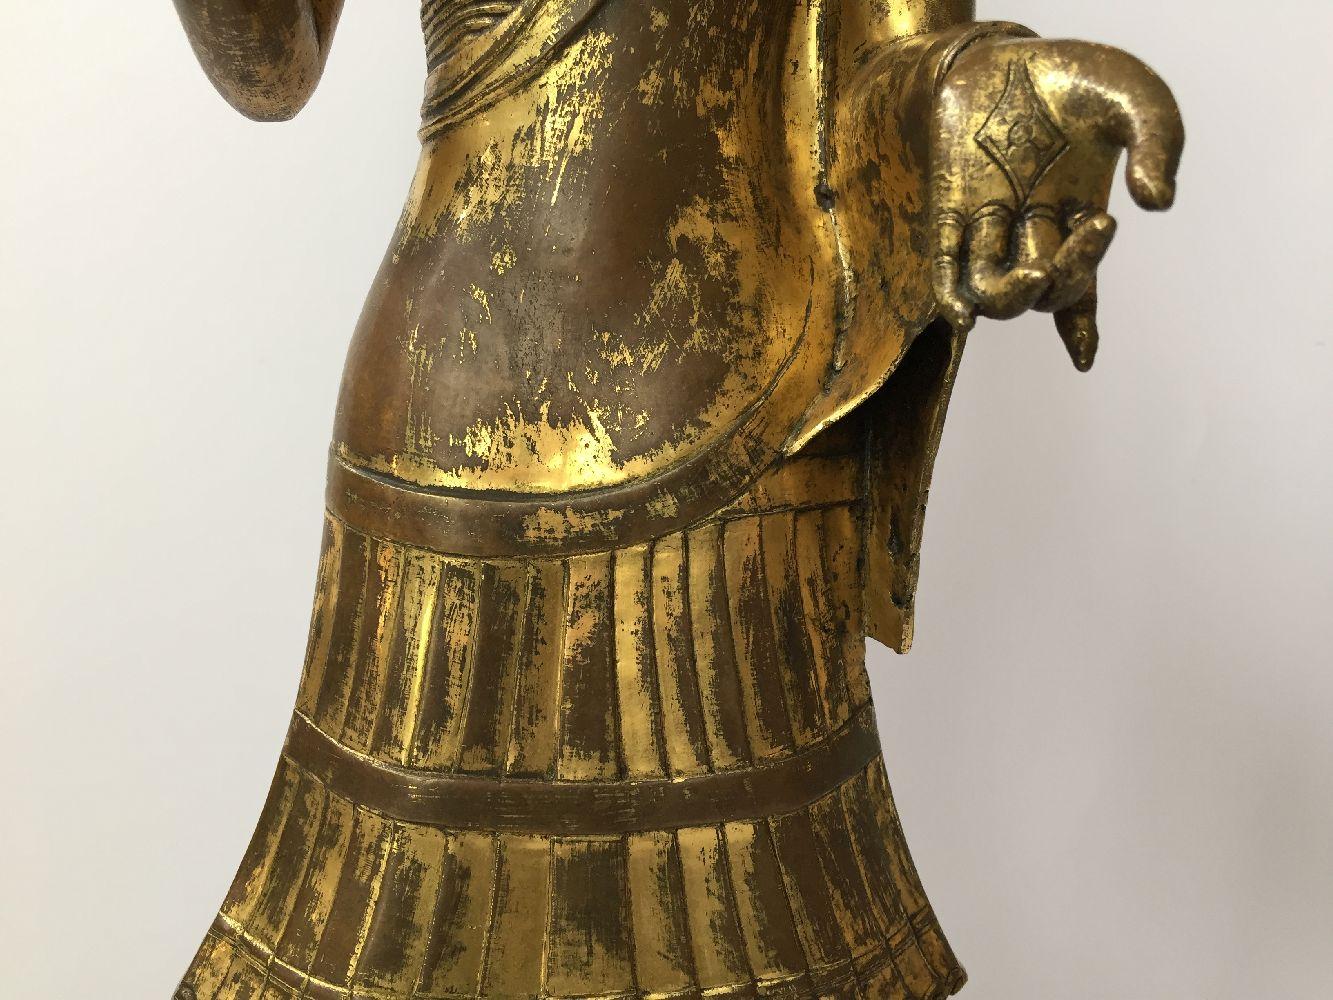 A large Sino-Tibetan gilt bronze standing figure of Avalokiteshvara, 17th century, the right hand is - Image 12 of 16